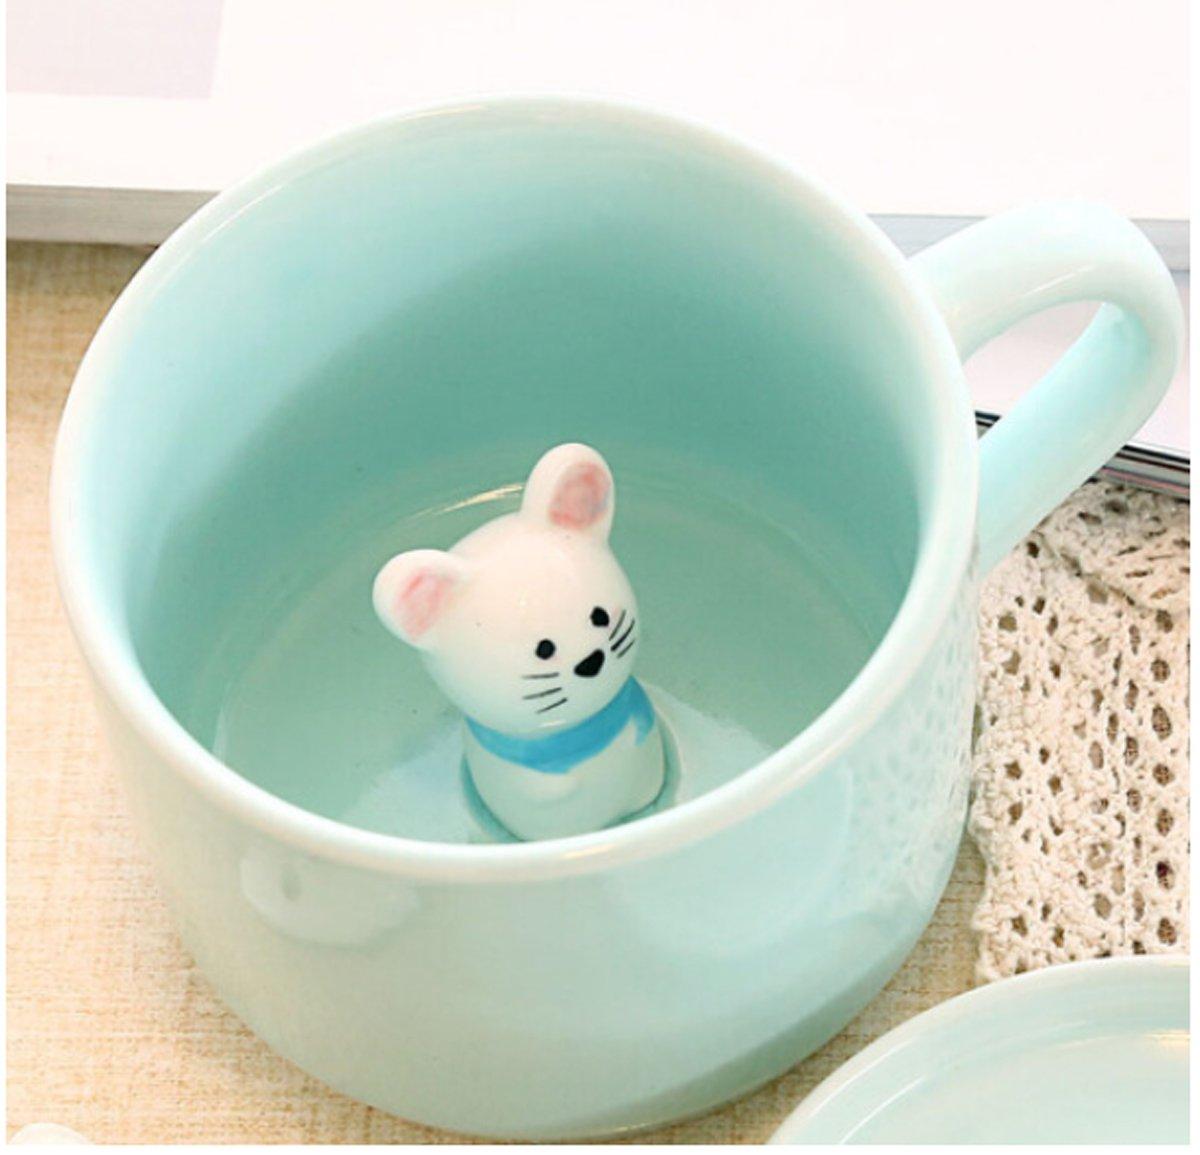 Baby Mouse - 3D Cartoon Animal Inside, Cute Ceramic Mug Funny Coffee Mugs - 8 OZ